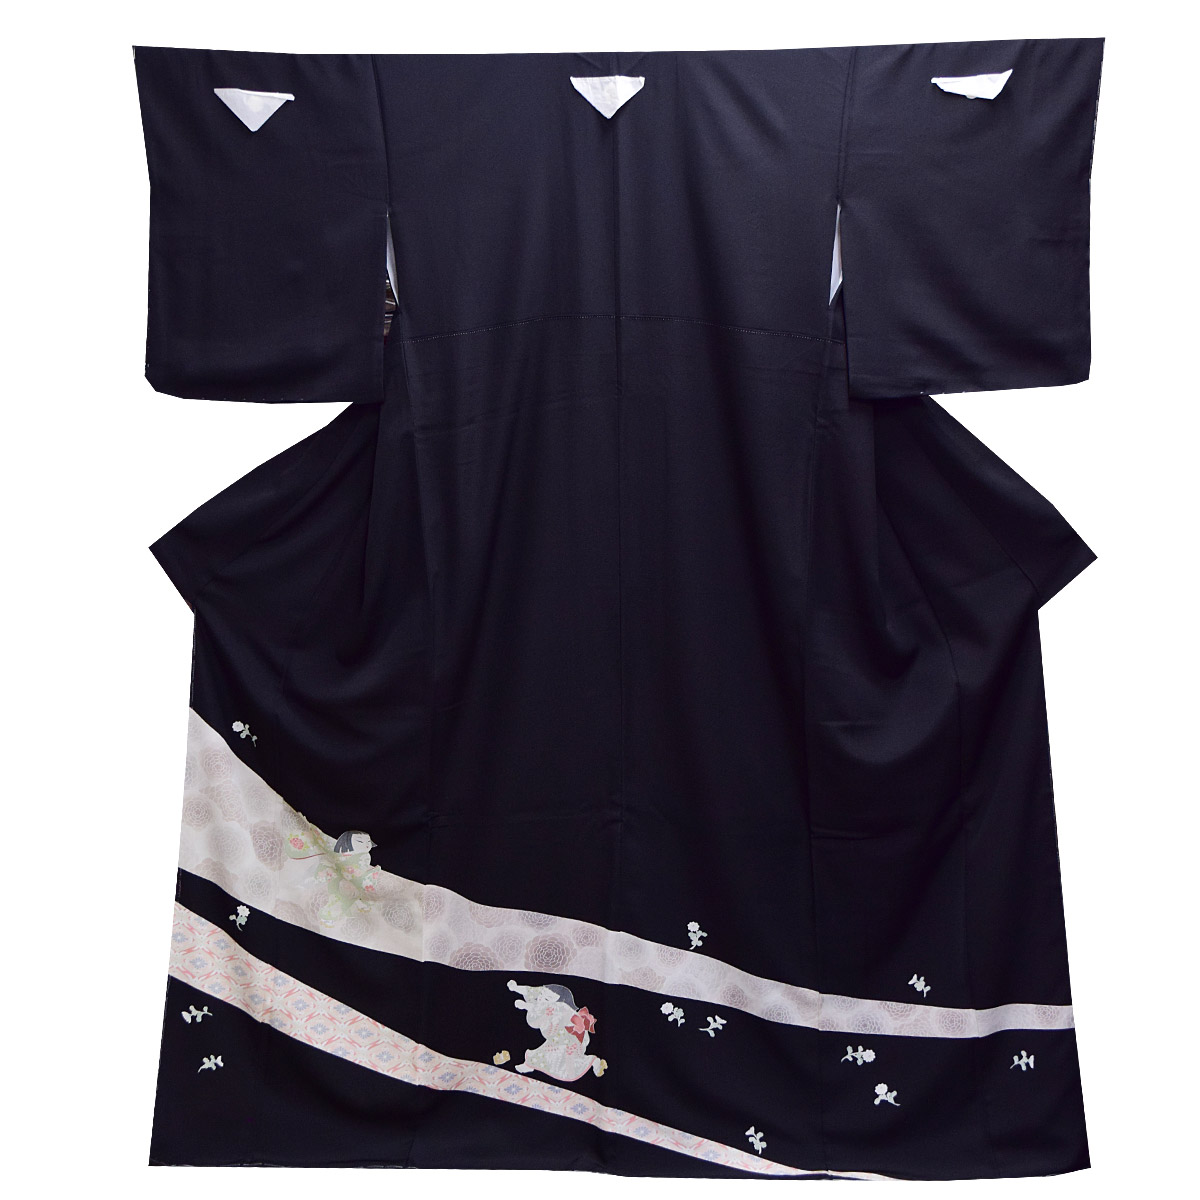 M寸礼装 黒留袖 単品 黒 仕立て上がり 童【紋入れ代込み】番号112645 正絹 留袖